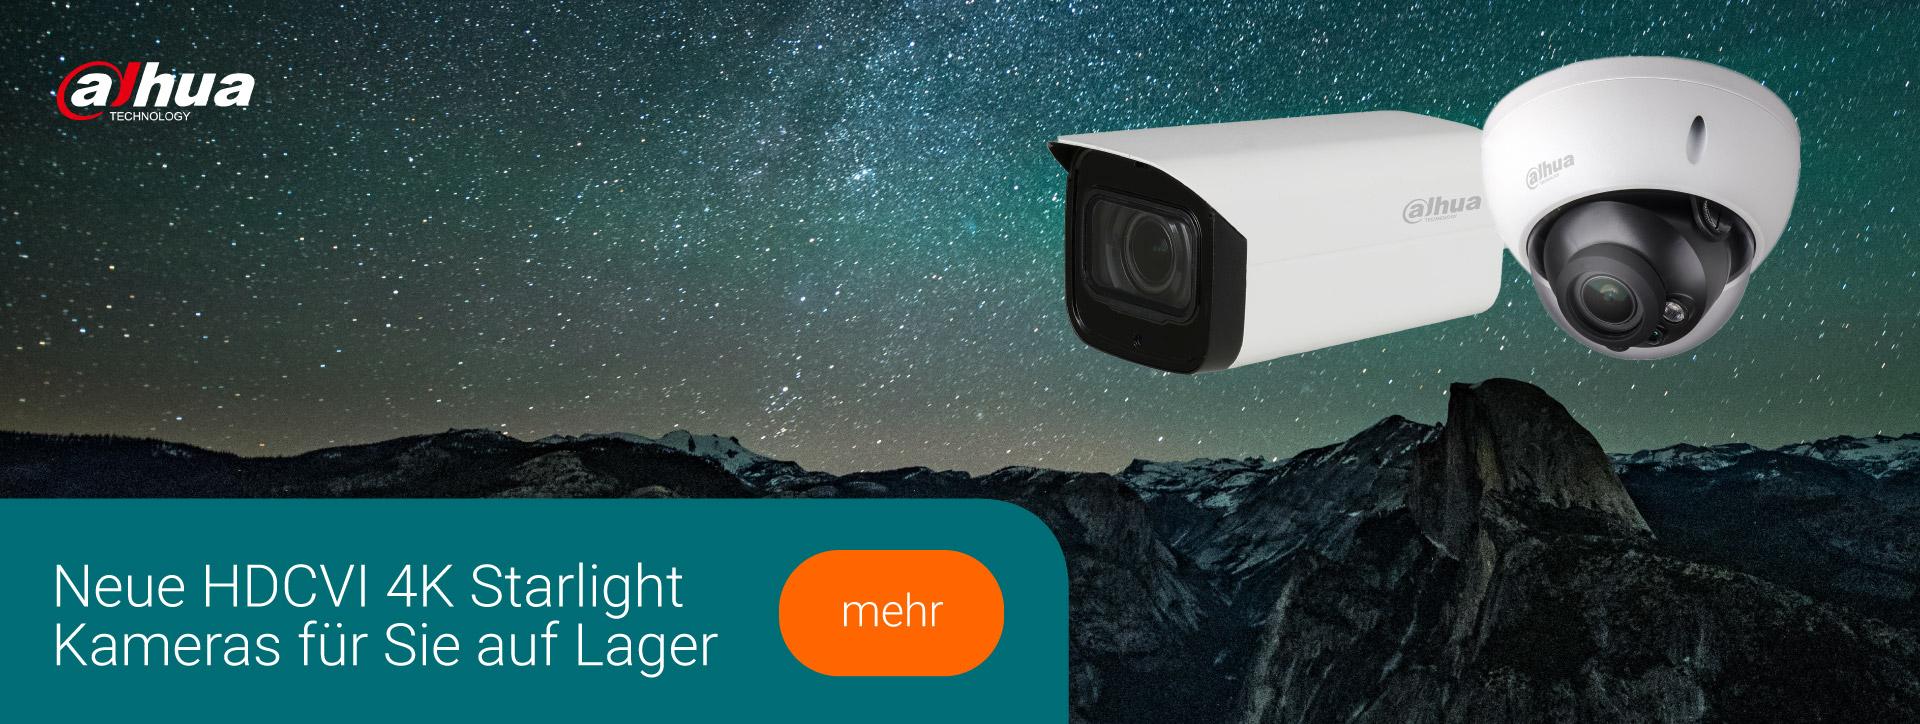 Banner Dahua HDCVI 4K Starlight